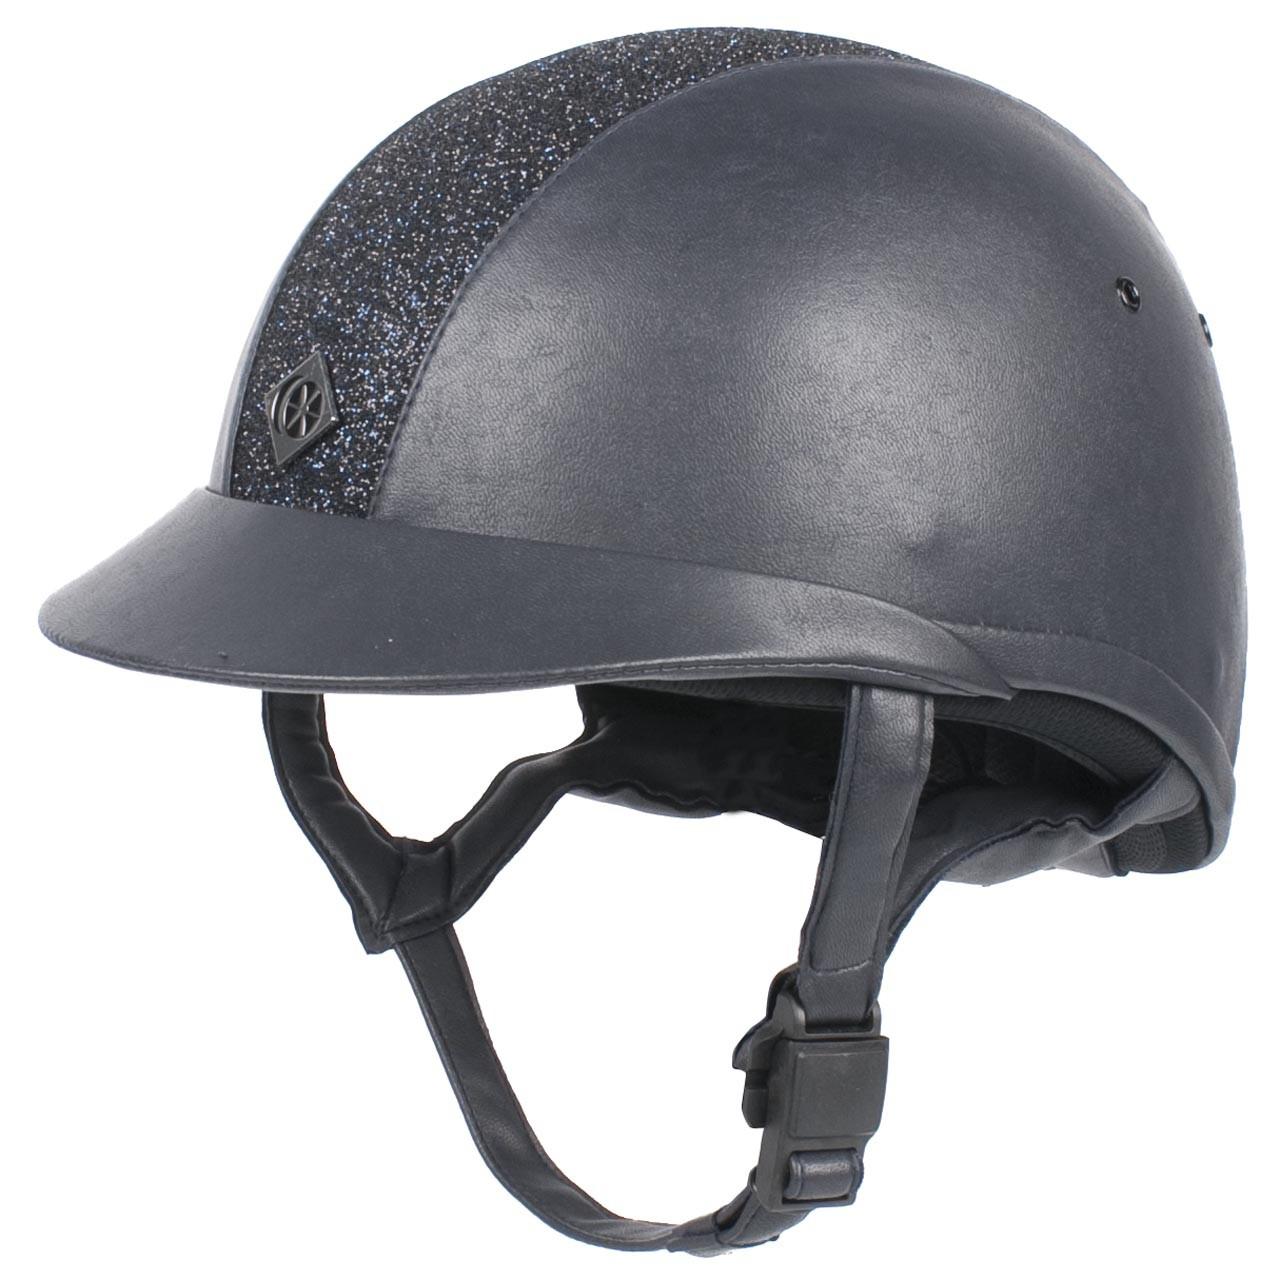 Charles Owen Elumen8 leather cap